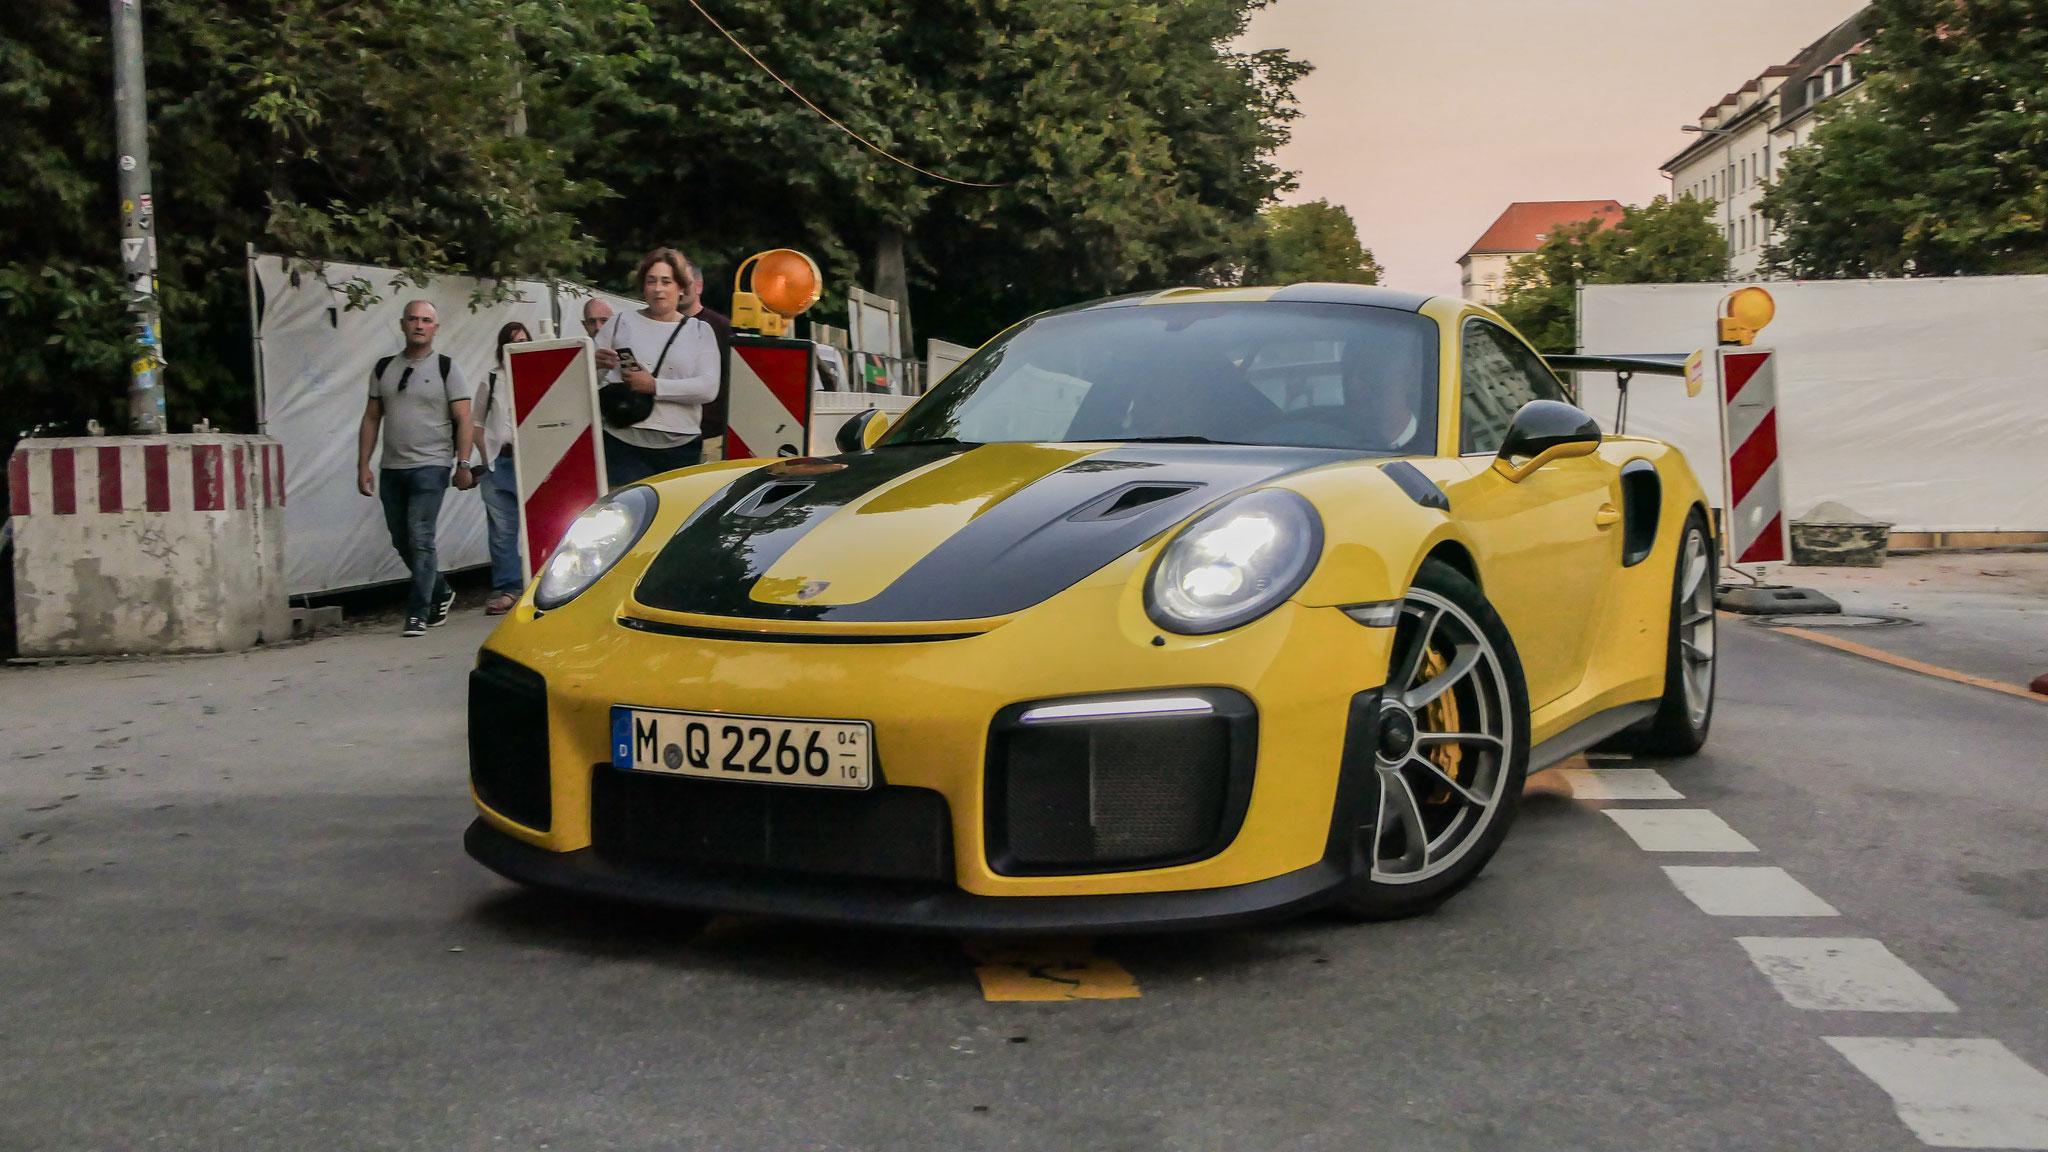 Porsche GT2 RS - M-Q-2266